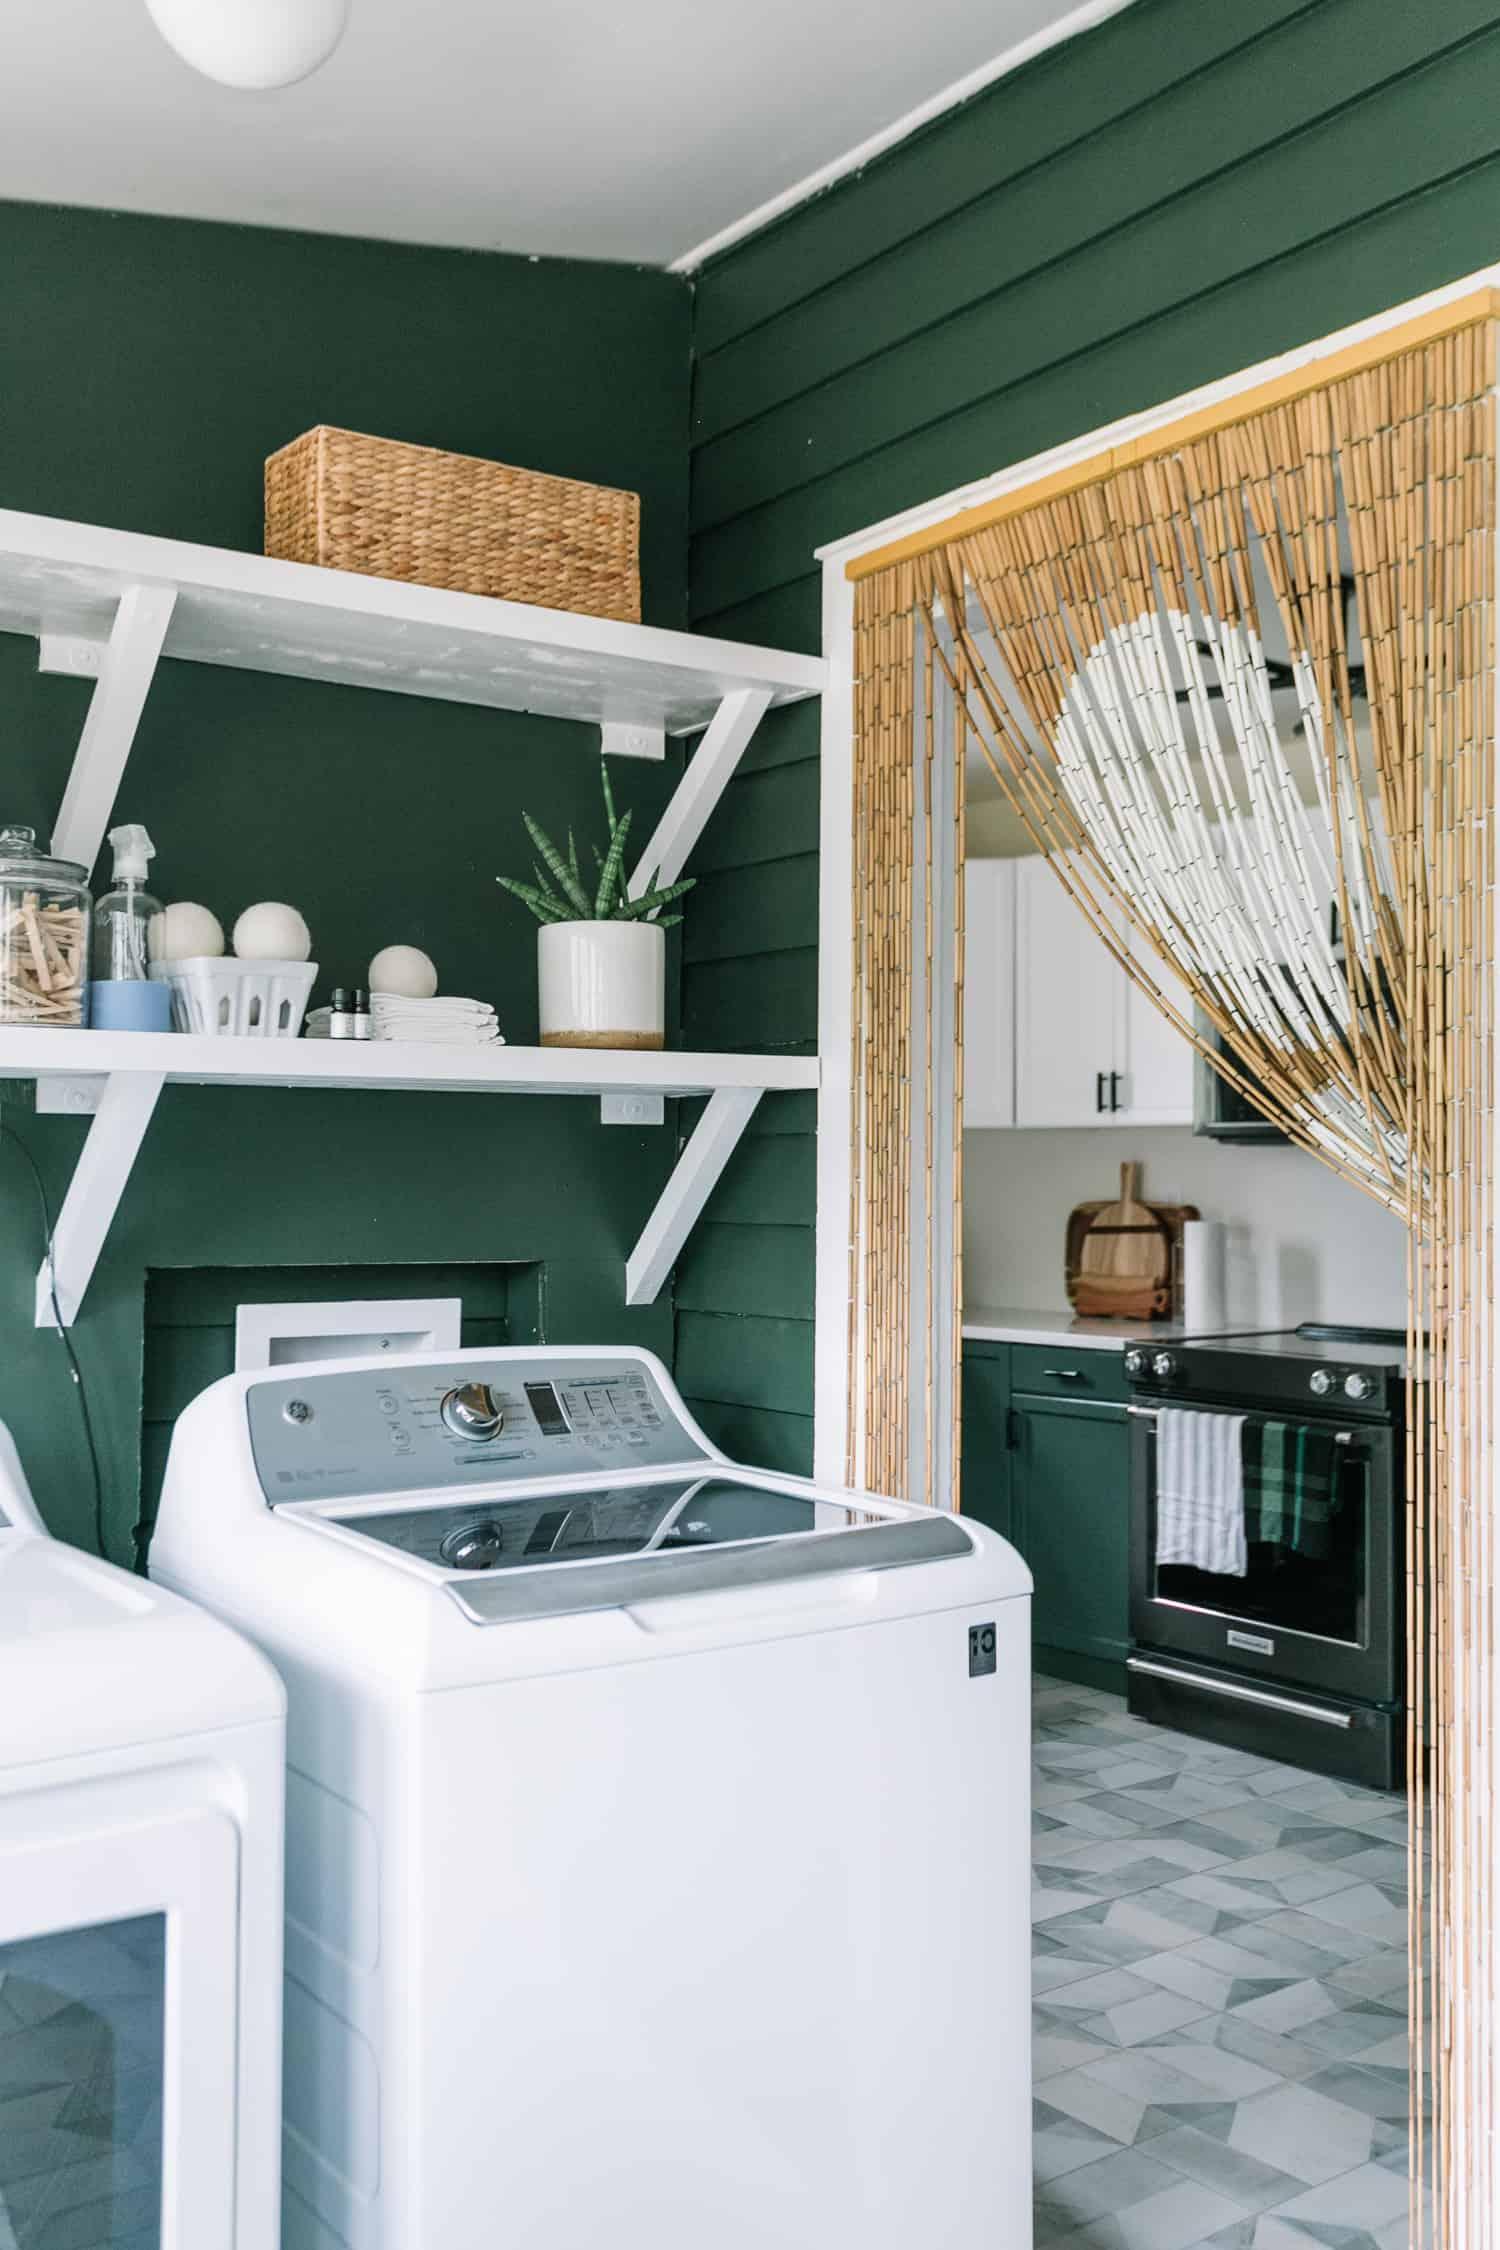 hight resolution of laundry room design organization tips